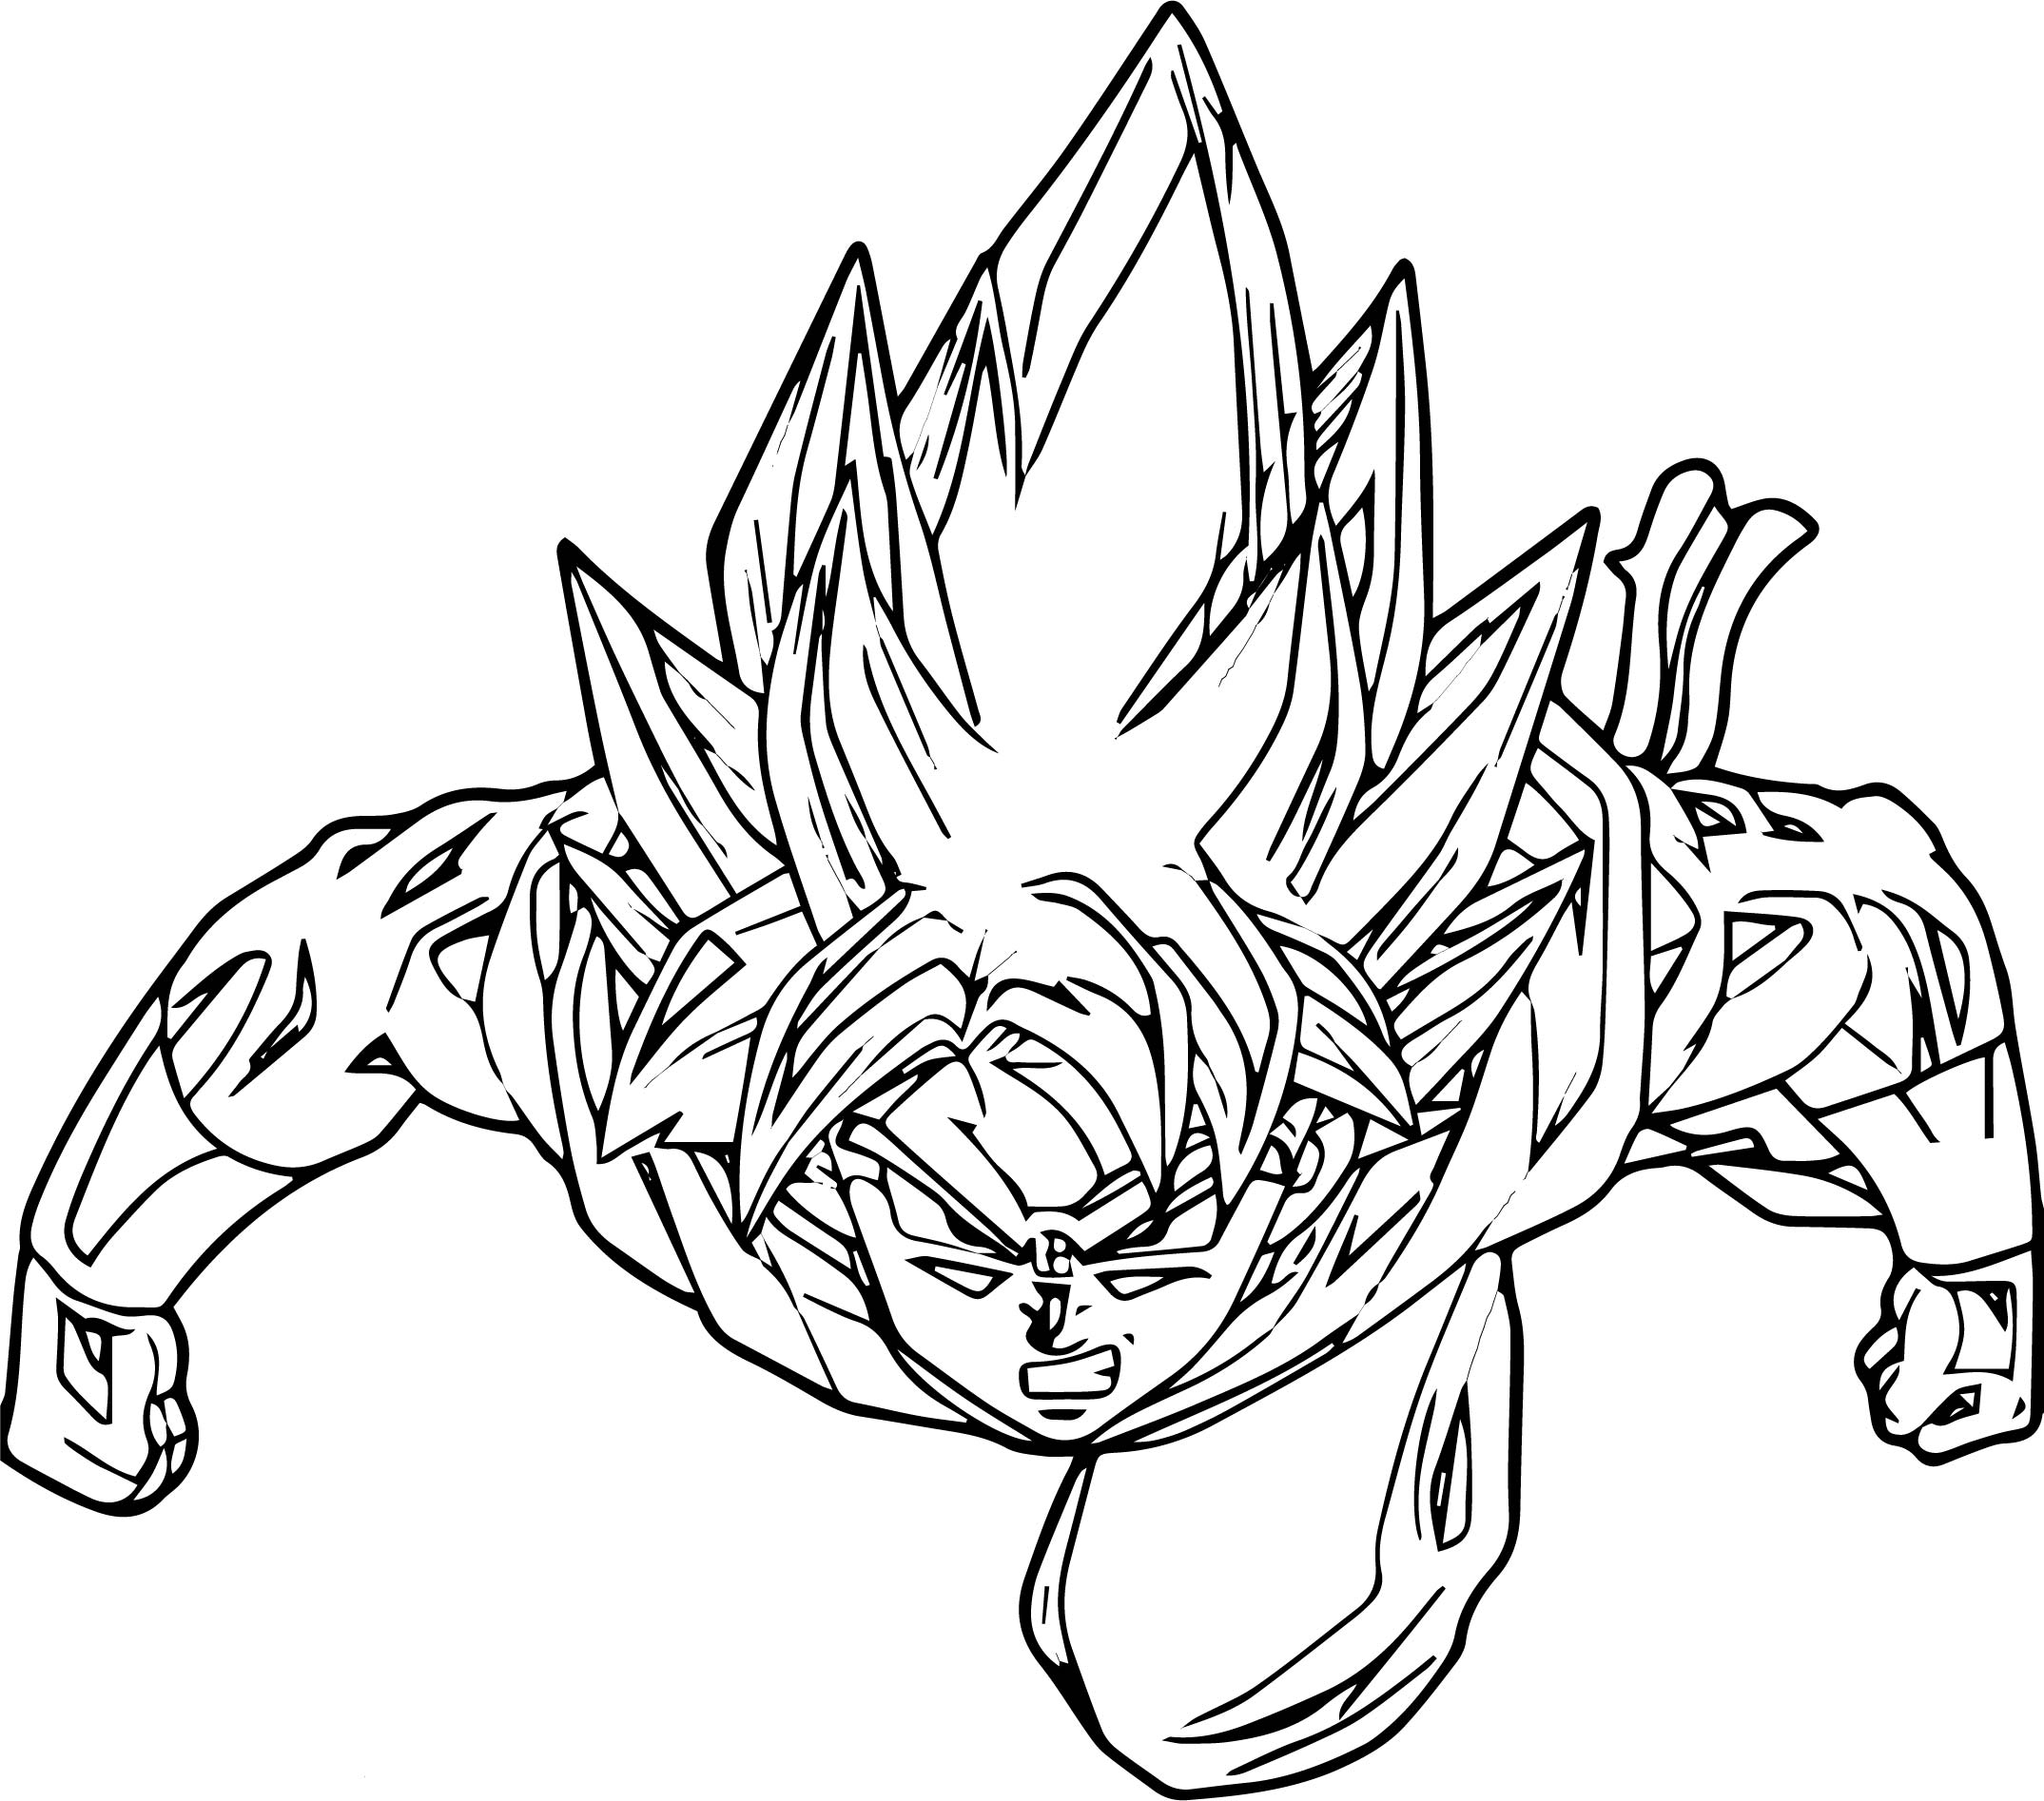 Goku We Coloring Page 039